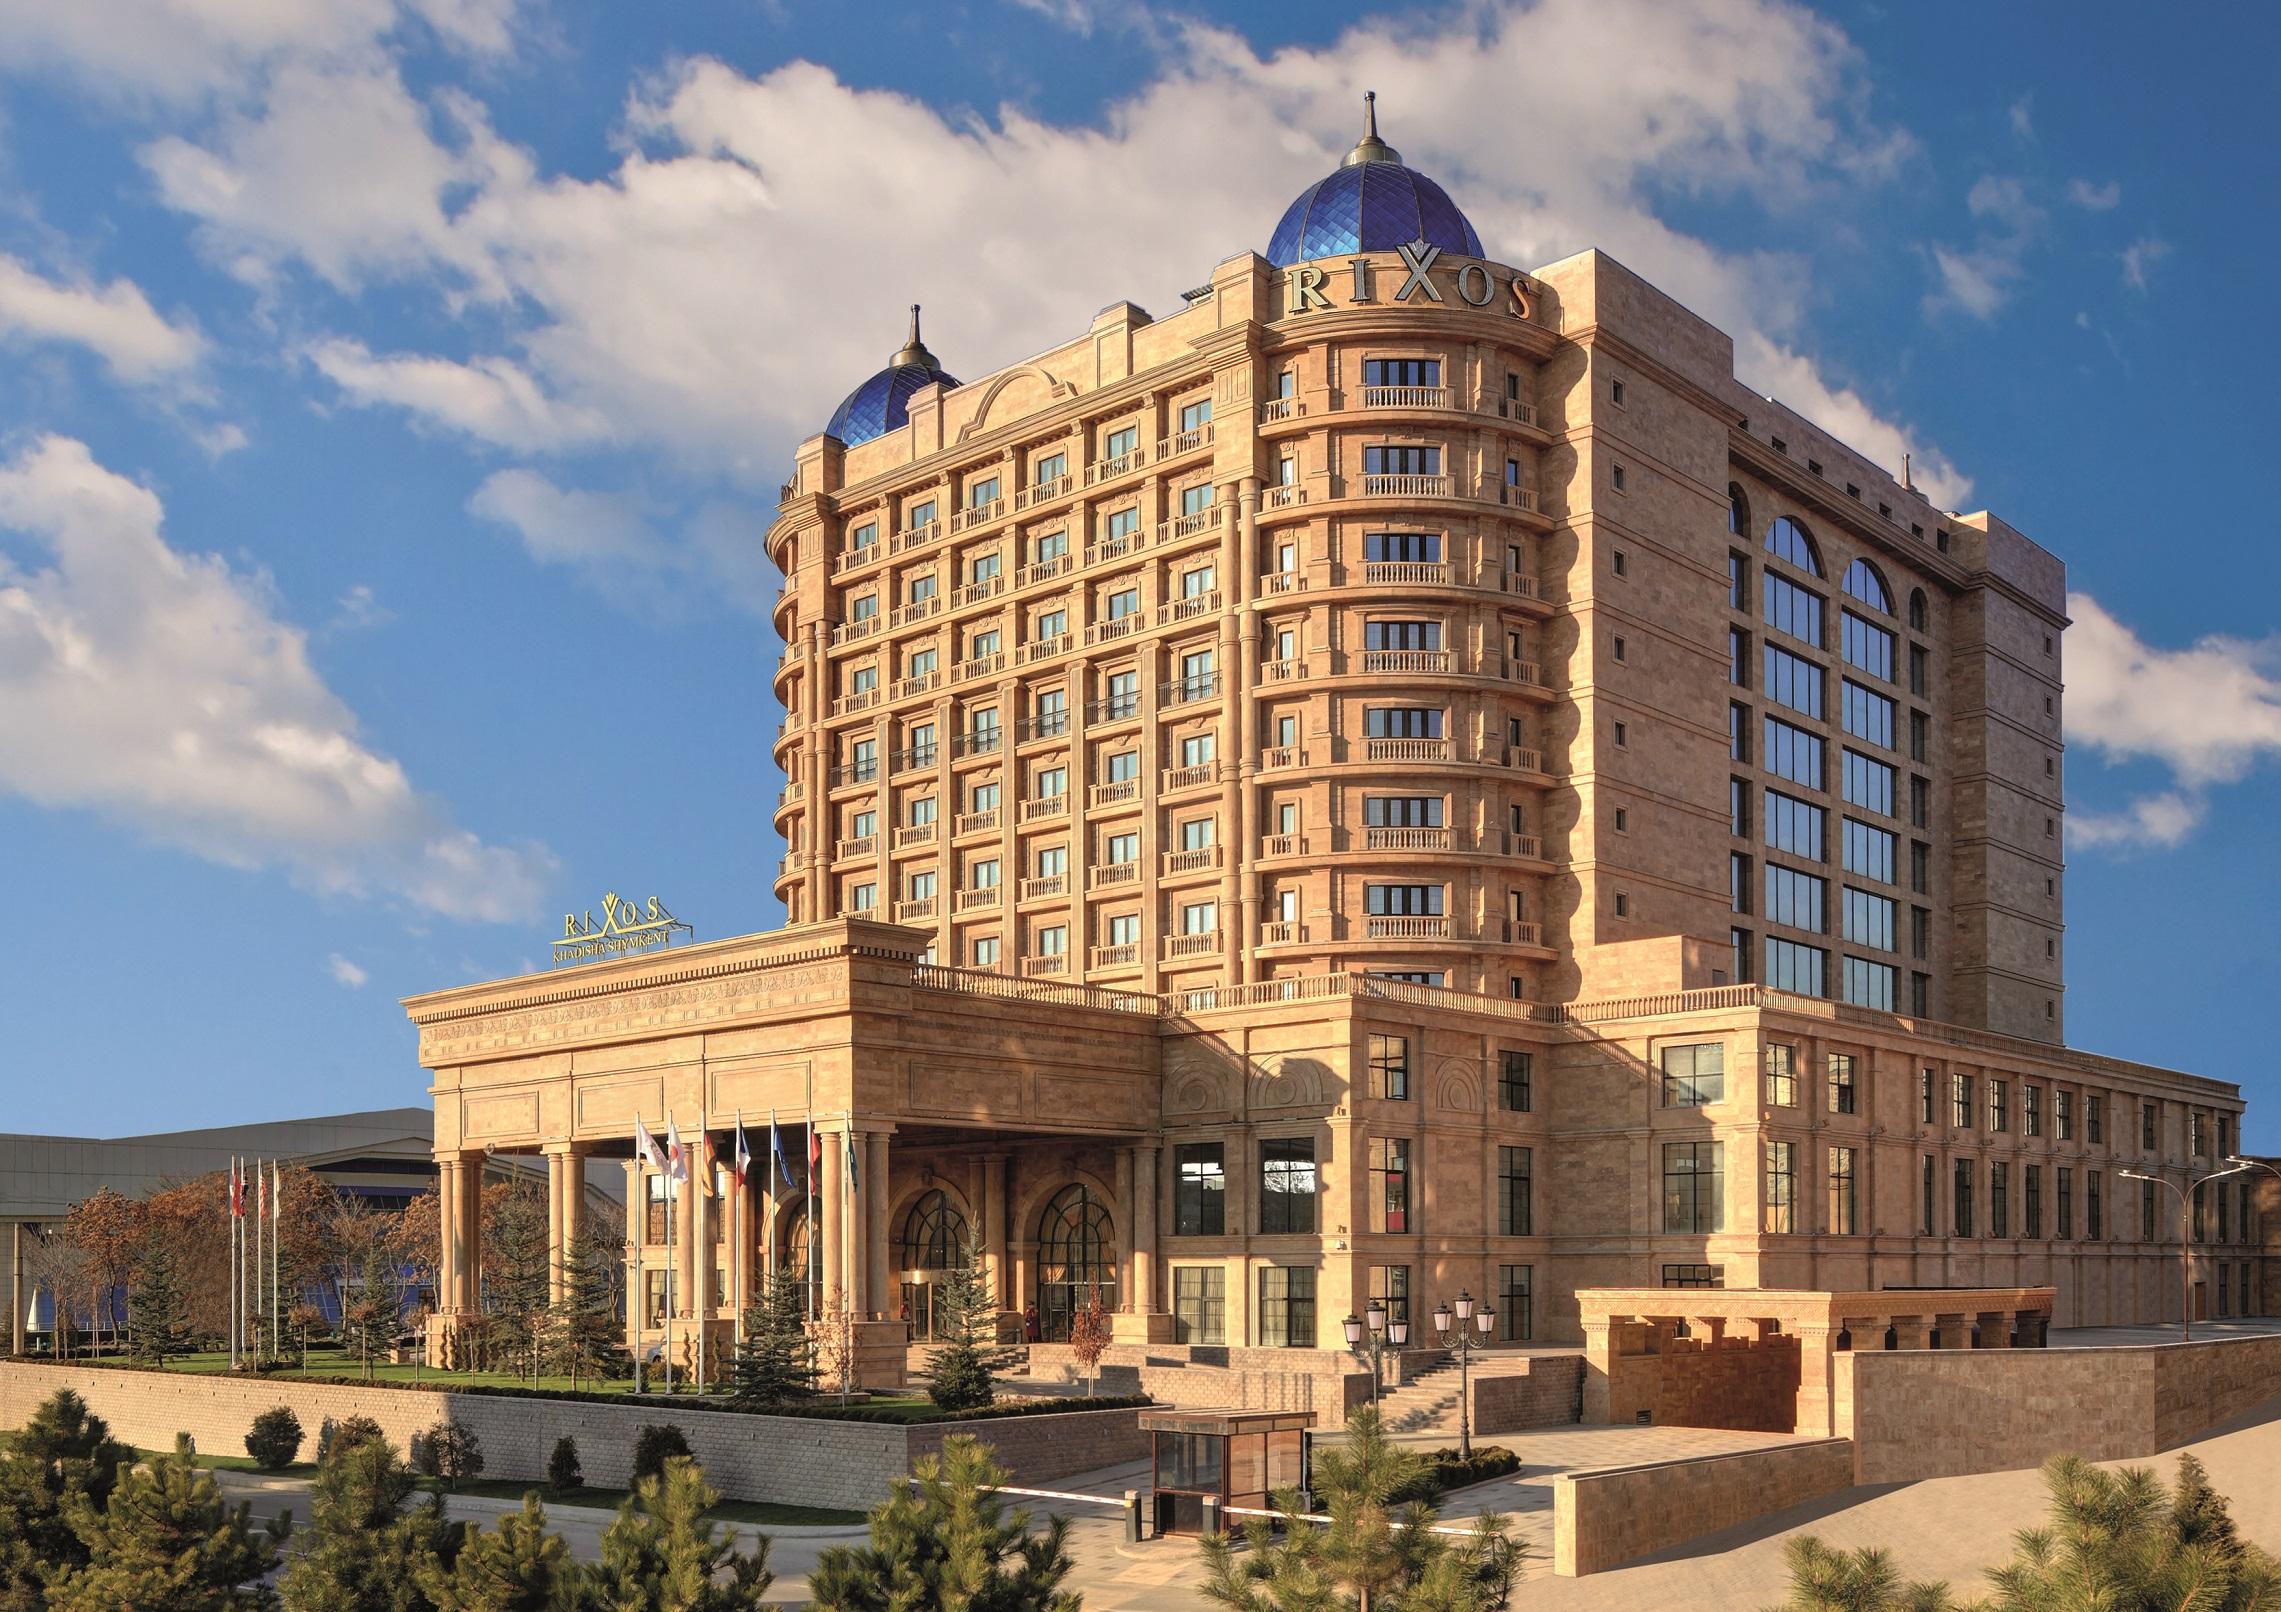 Shymkent Kazakhstan  city photo : Khadisha Shymkent, the first ever five star hotel in South Kazakhstan ...